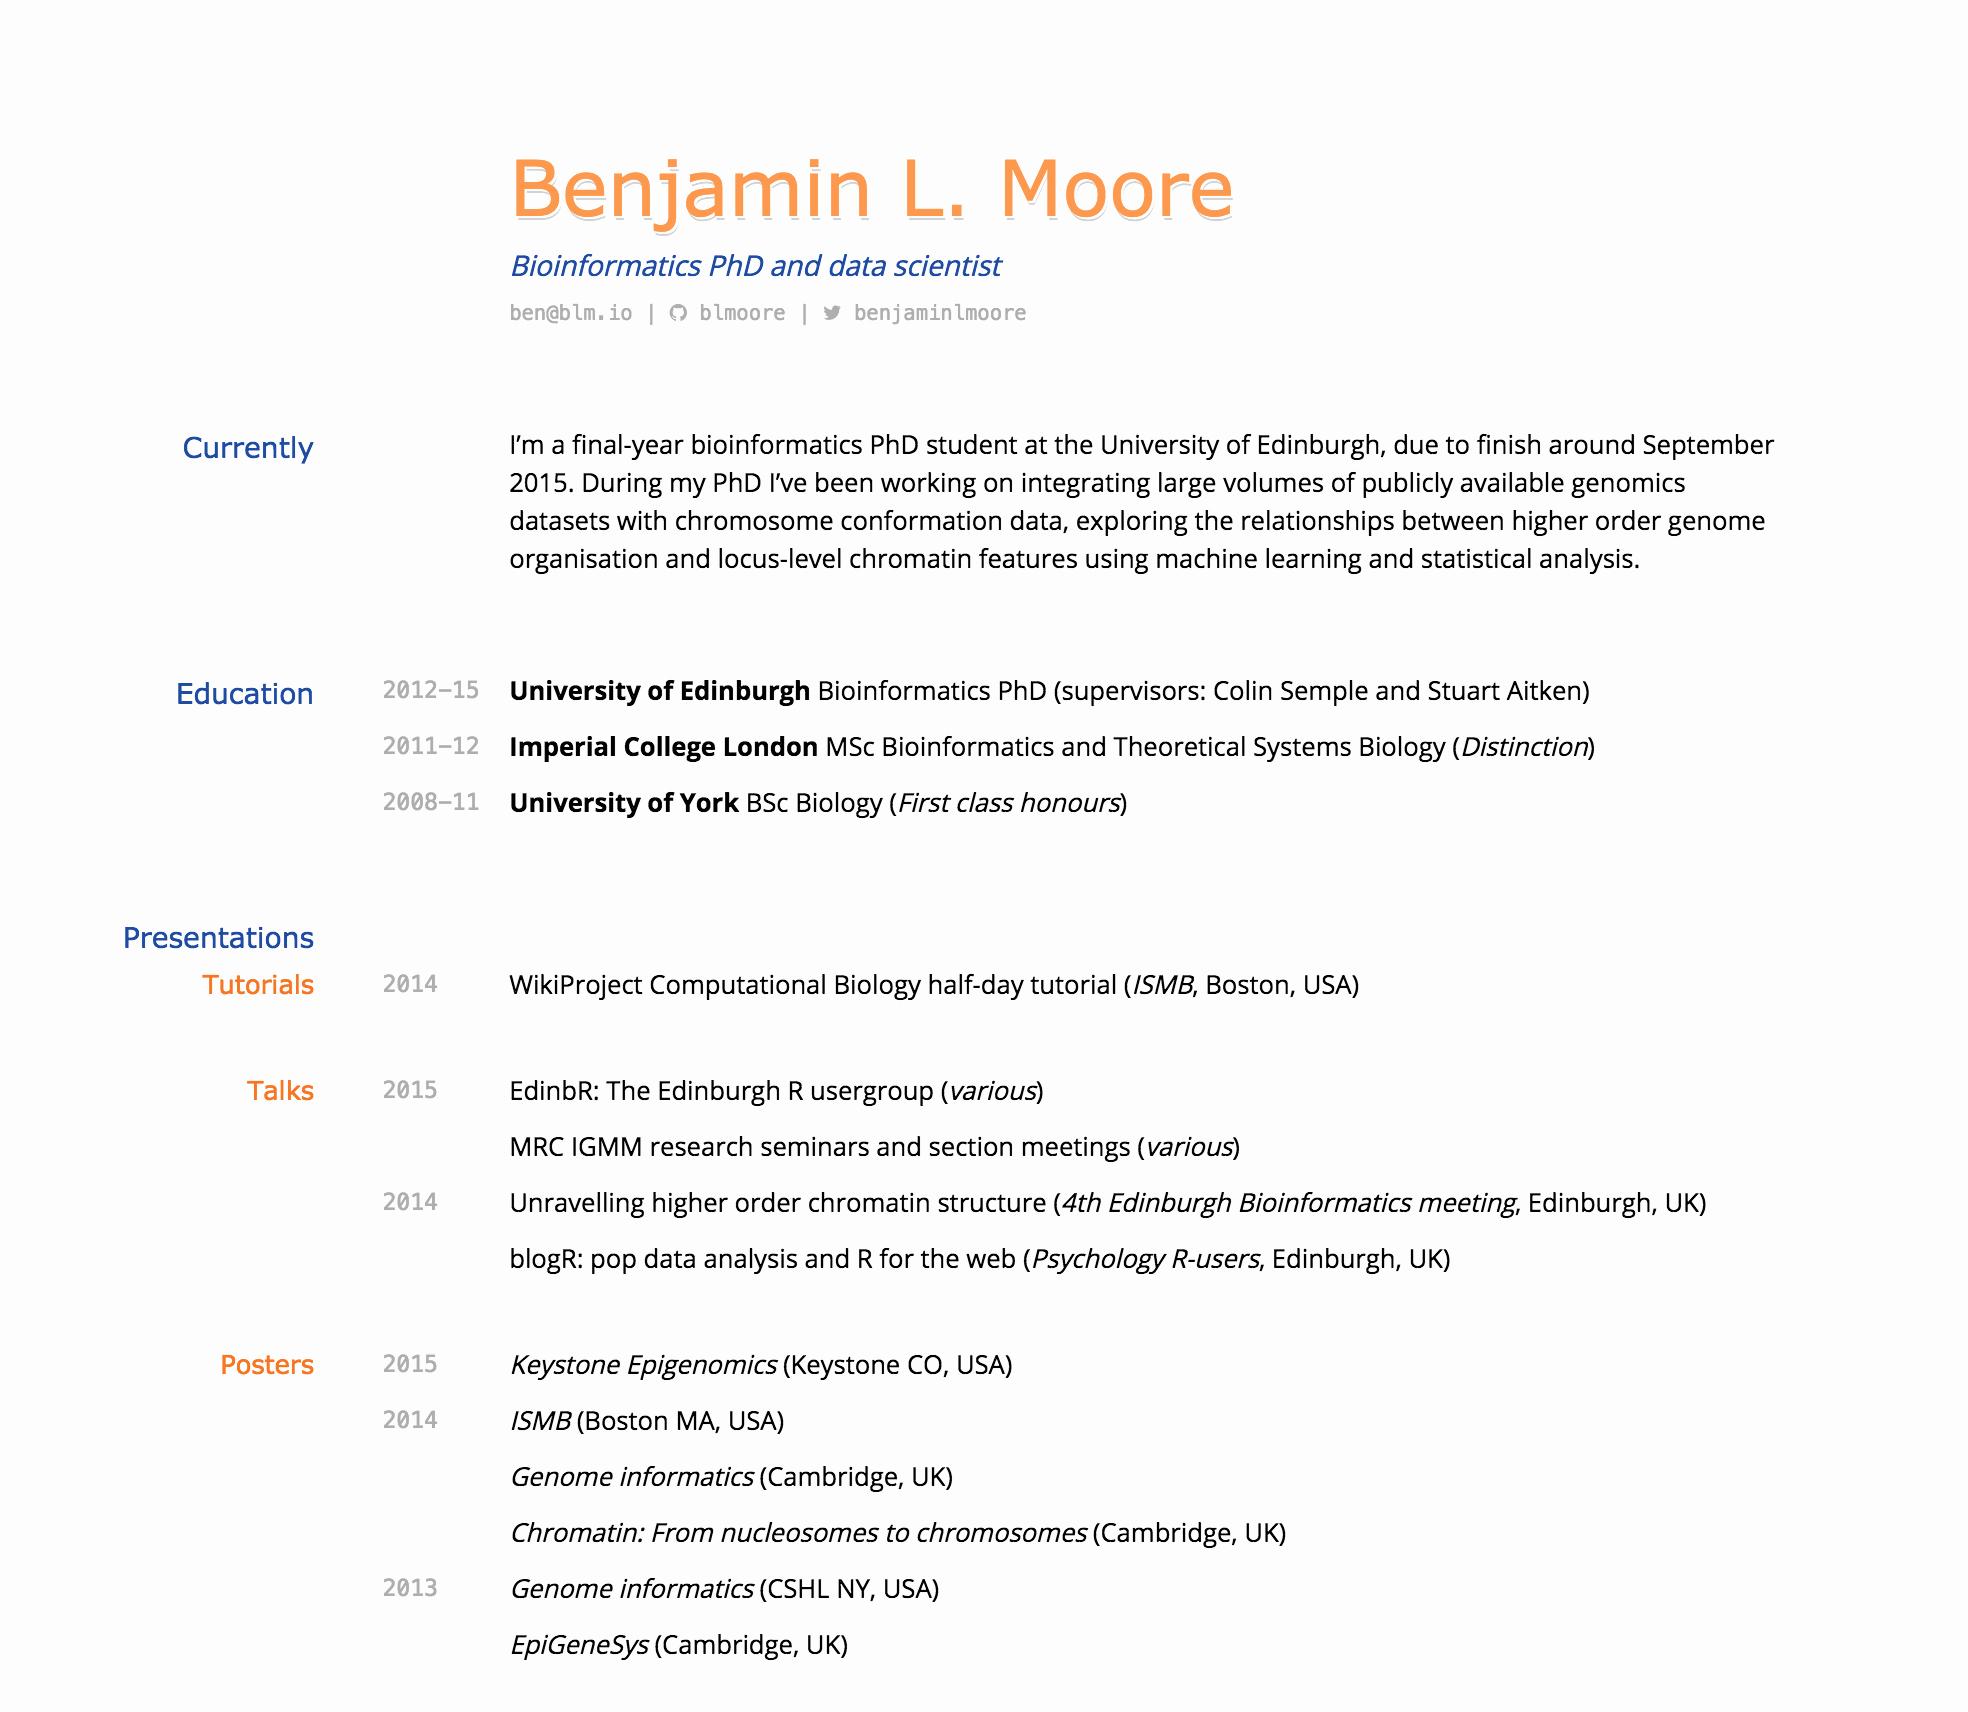 Academic Cv Template Word Fresh Resume Template Academic Word Best S Cv within 81